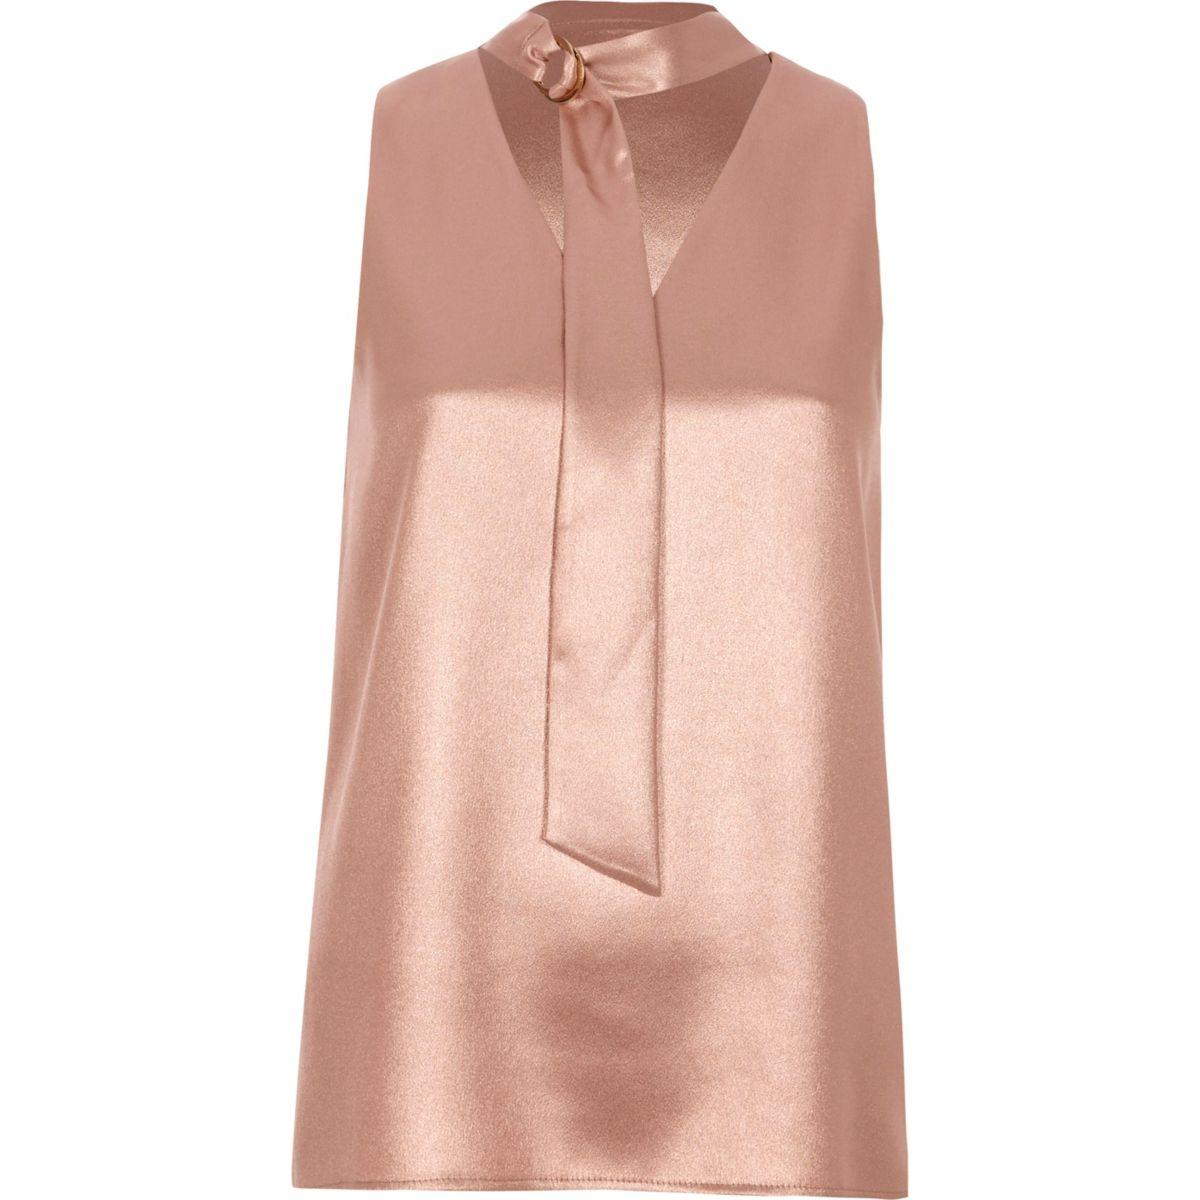 Pink metallic D-ring tie neck sleeveless top